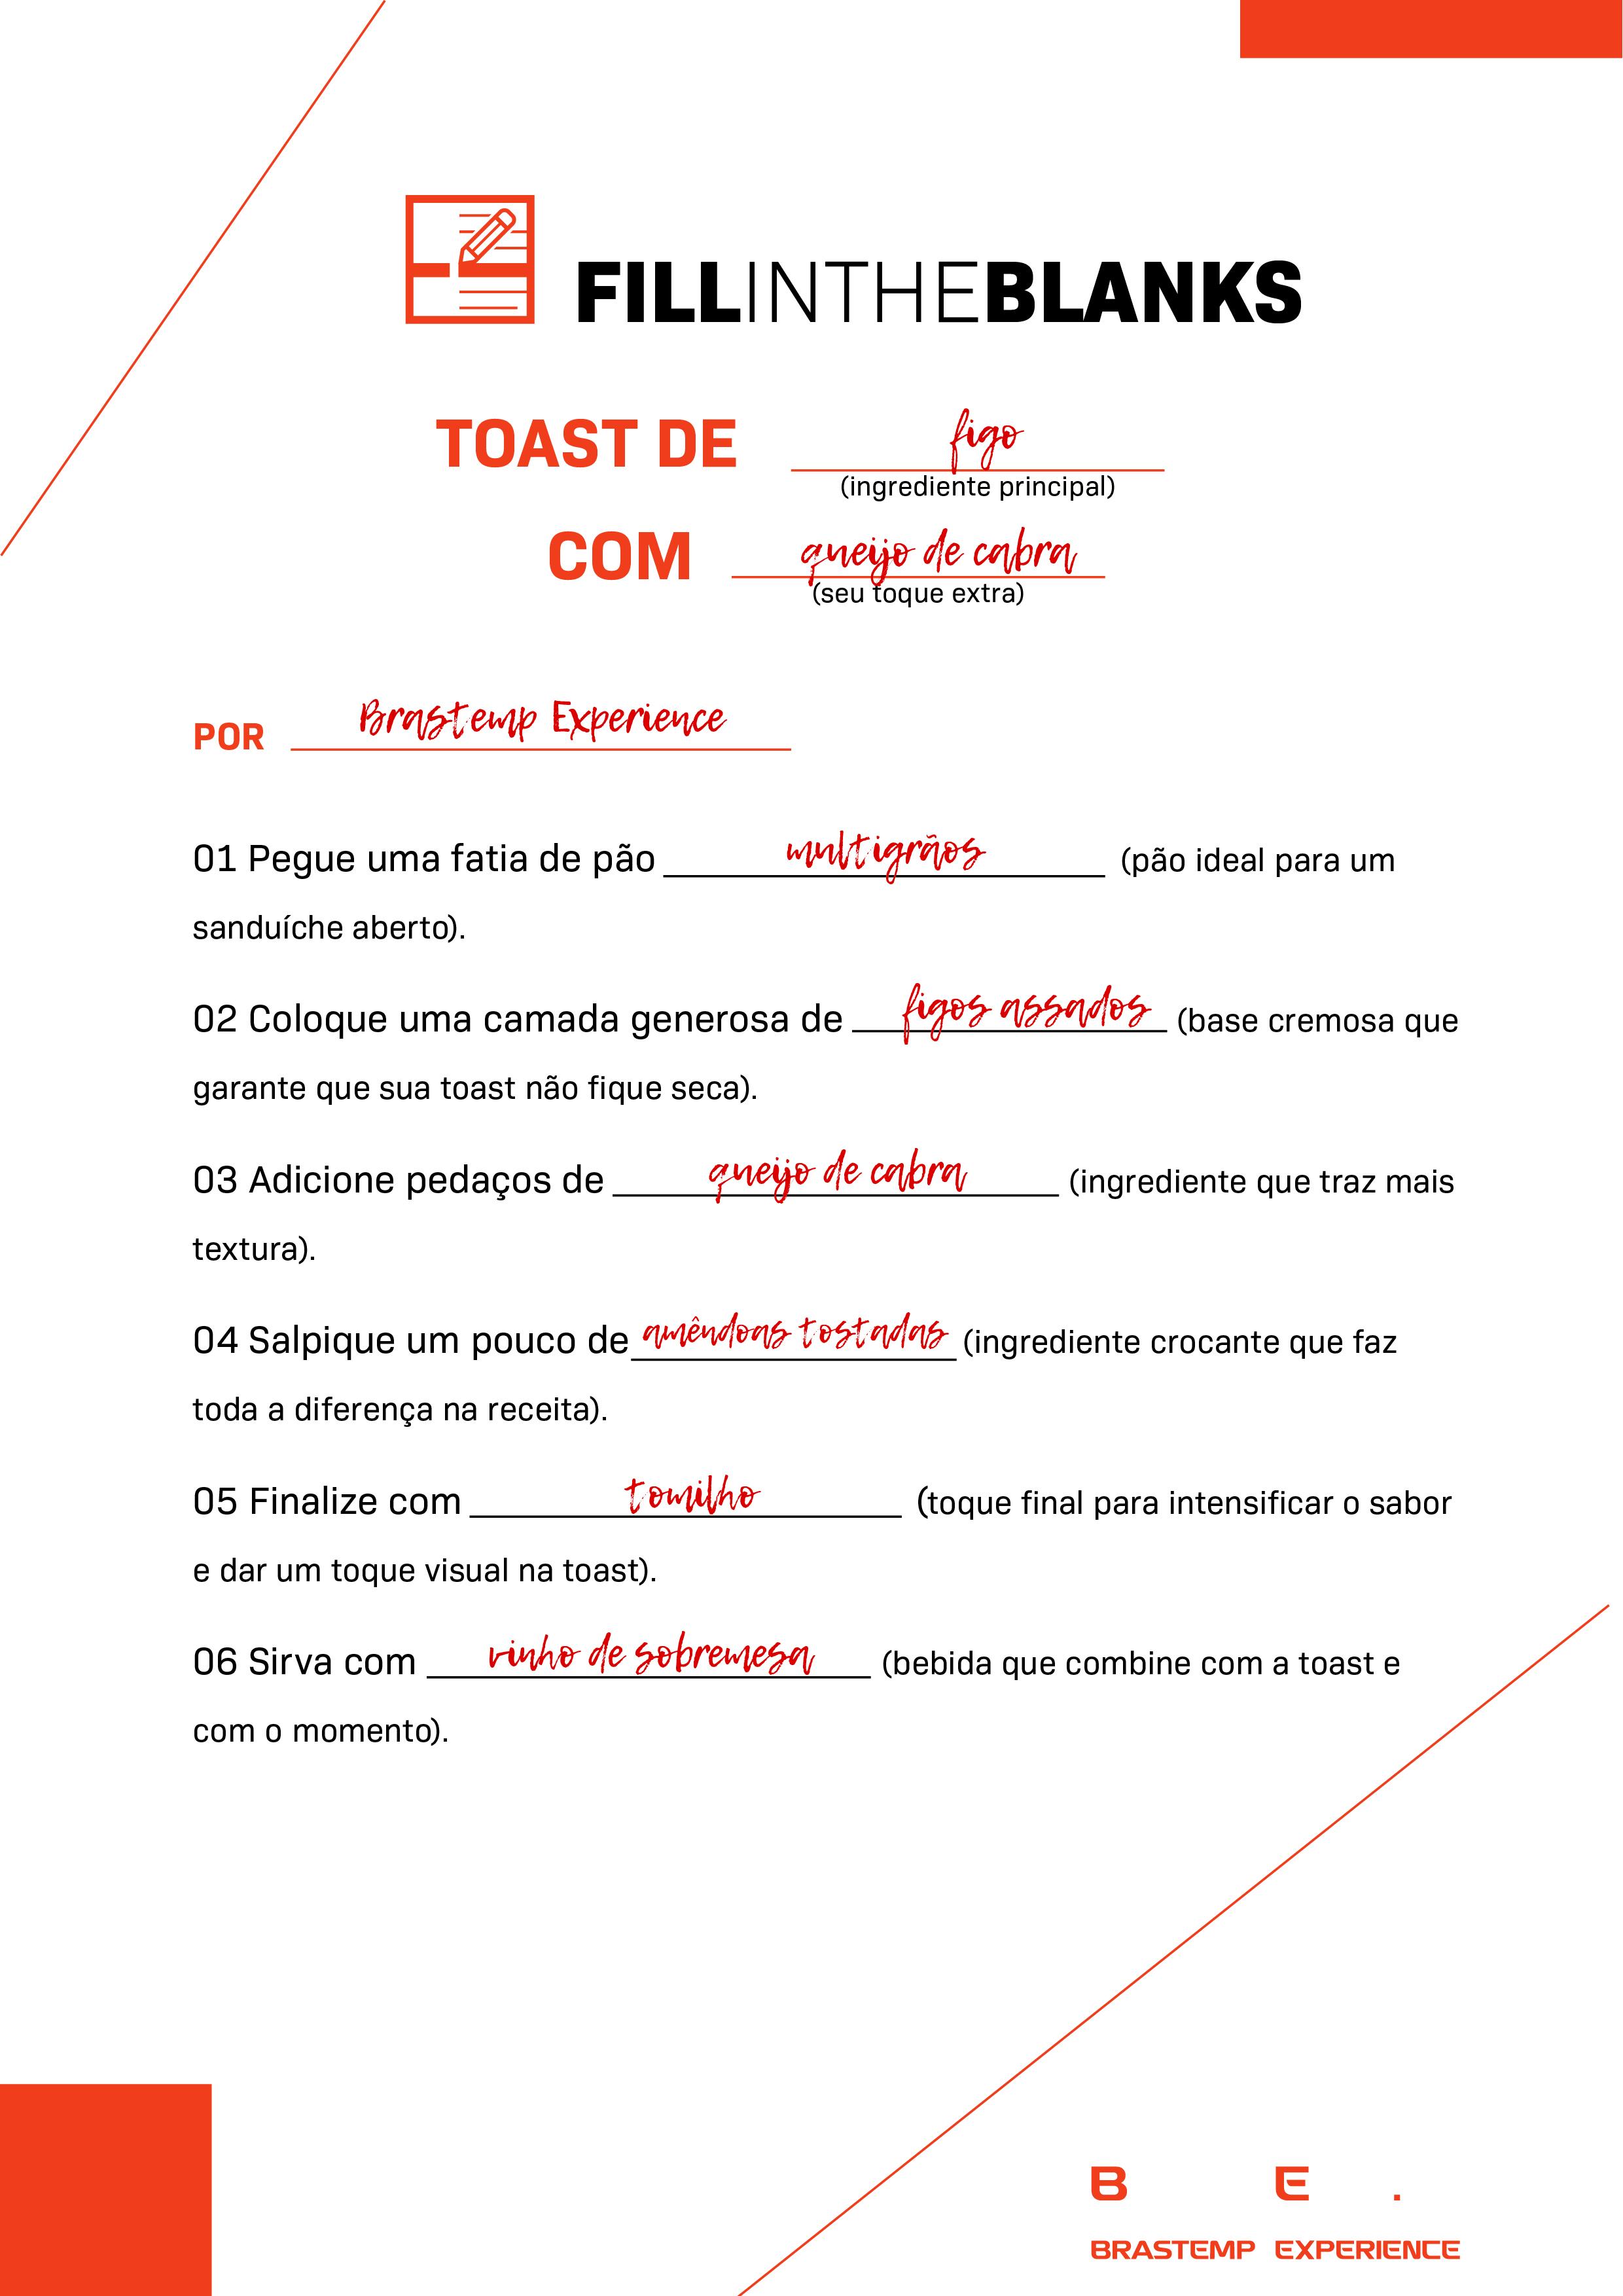 FITB_Toast_Figo_preenchida